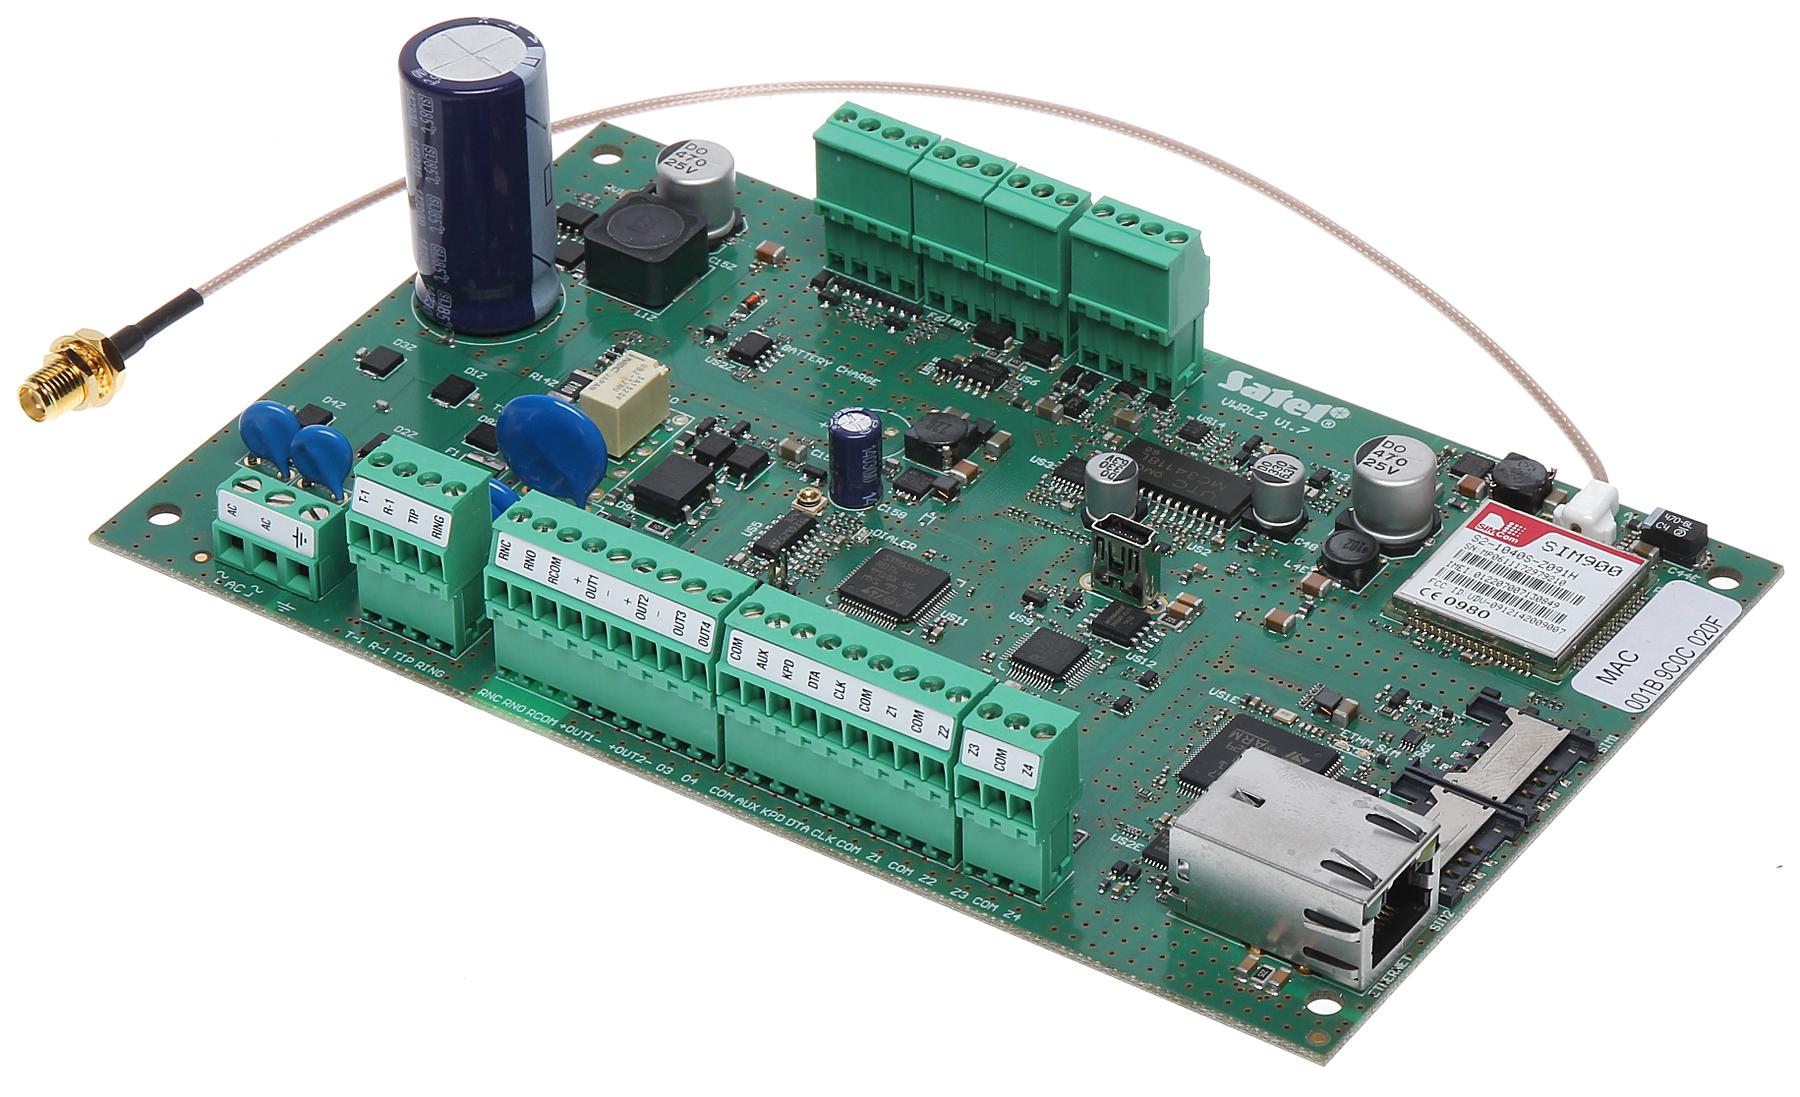 SATEL ALARM SYSTEM KIT VERSA-PLUS-TSGS SATEL - Alarm System Kits - Delta